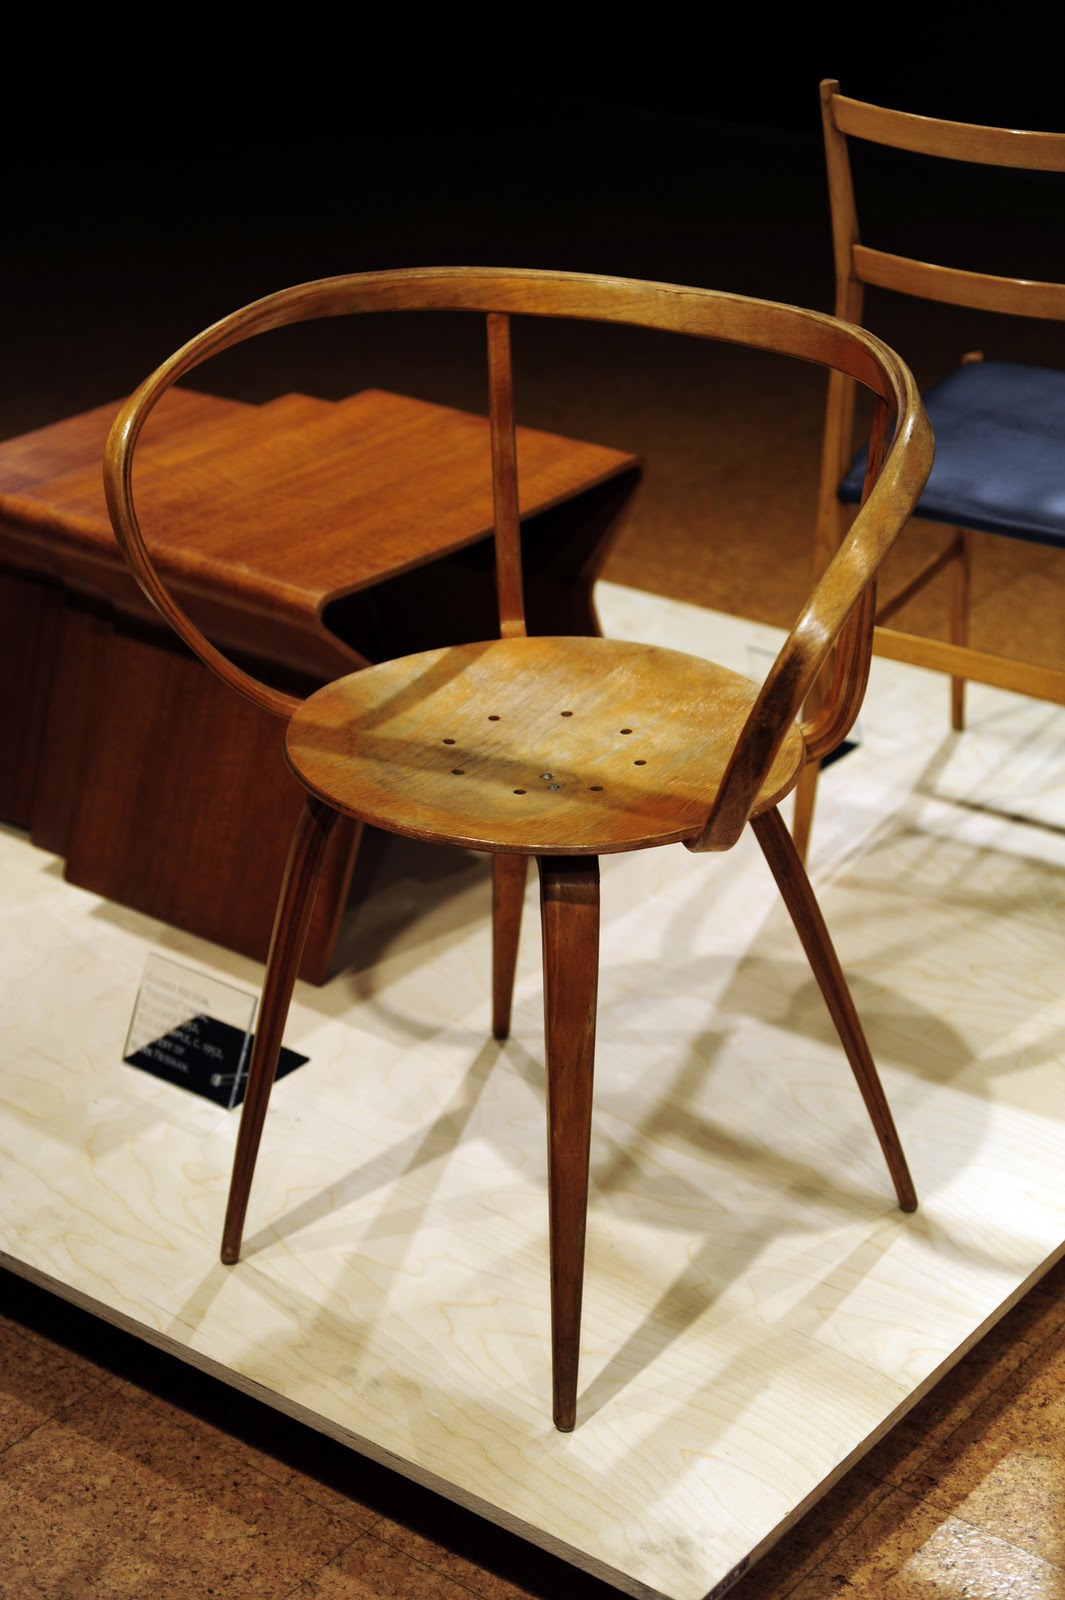 Nelsonu0027s U201cPretzelu201d Chair At NYSID